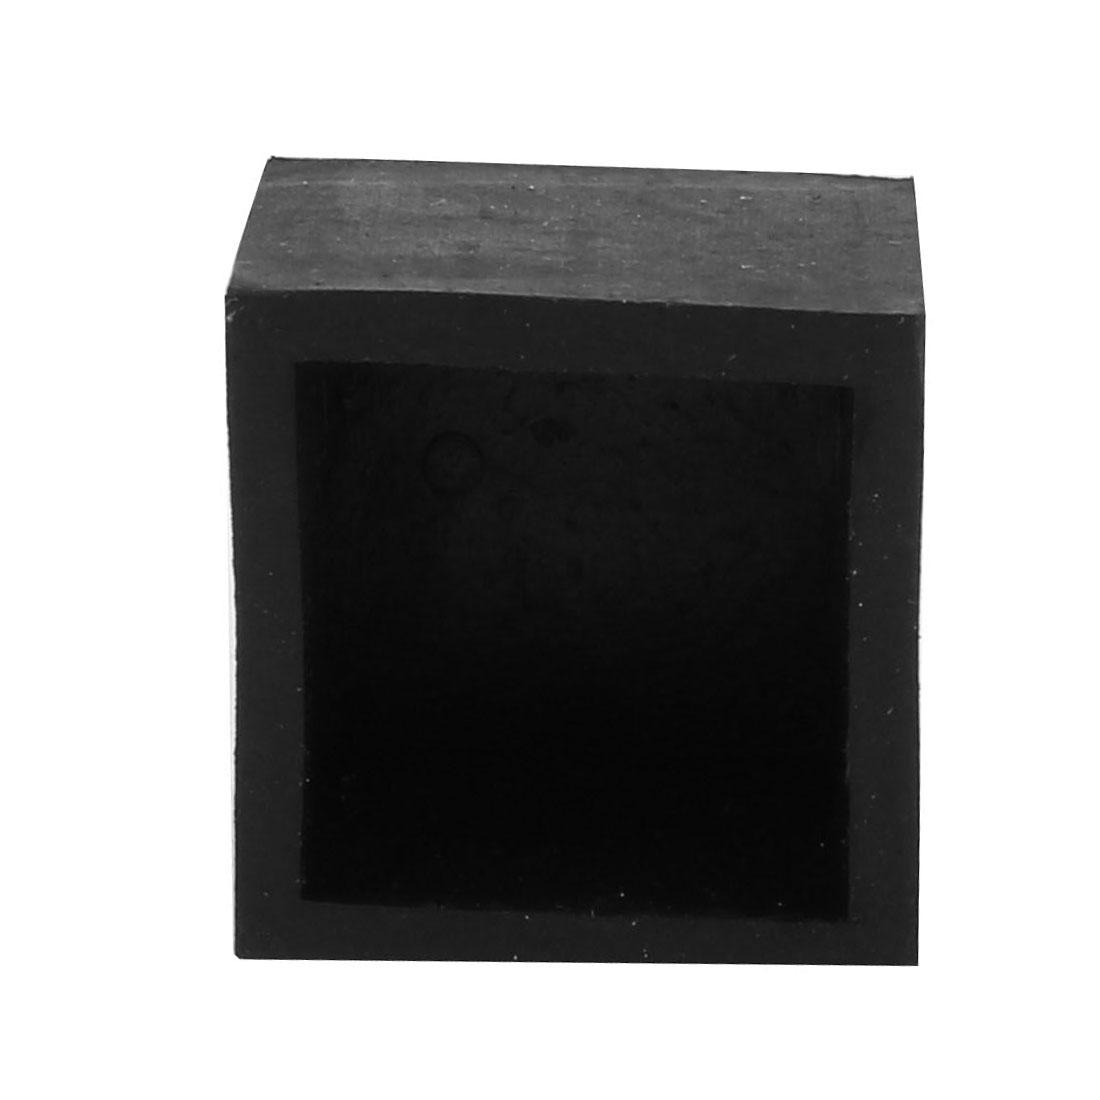 25mmx25mm Square Chair Leg Floor Protectors Table Feet Tips Covers Caps 8pcs - image 1 de 3